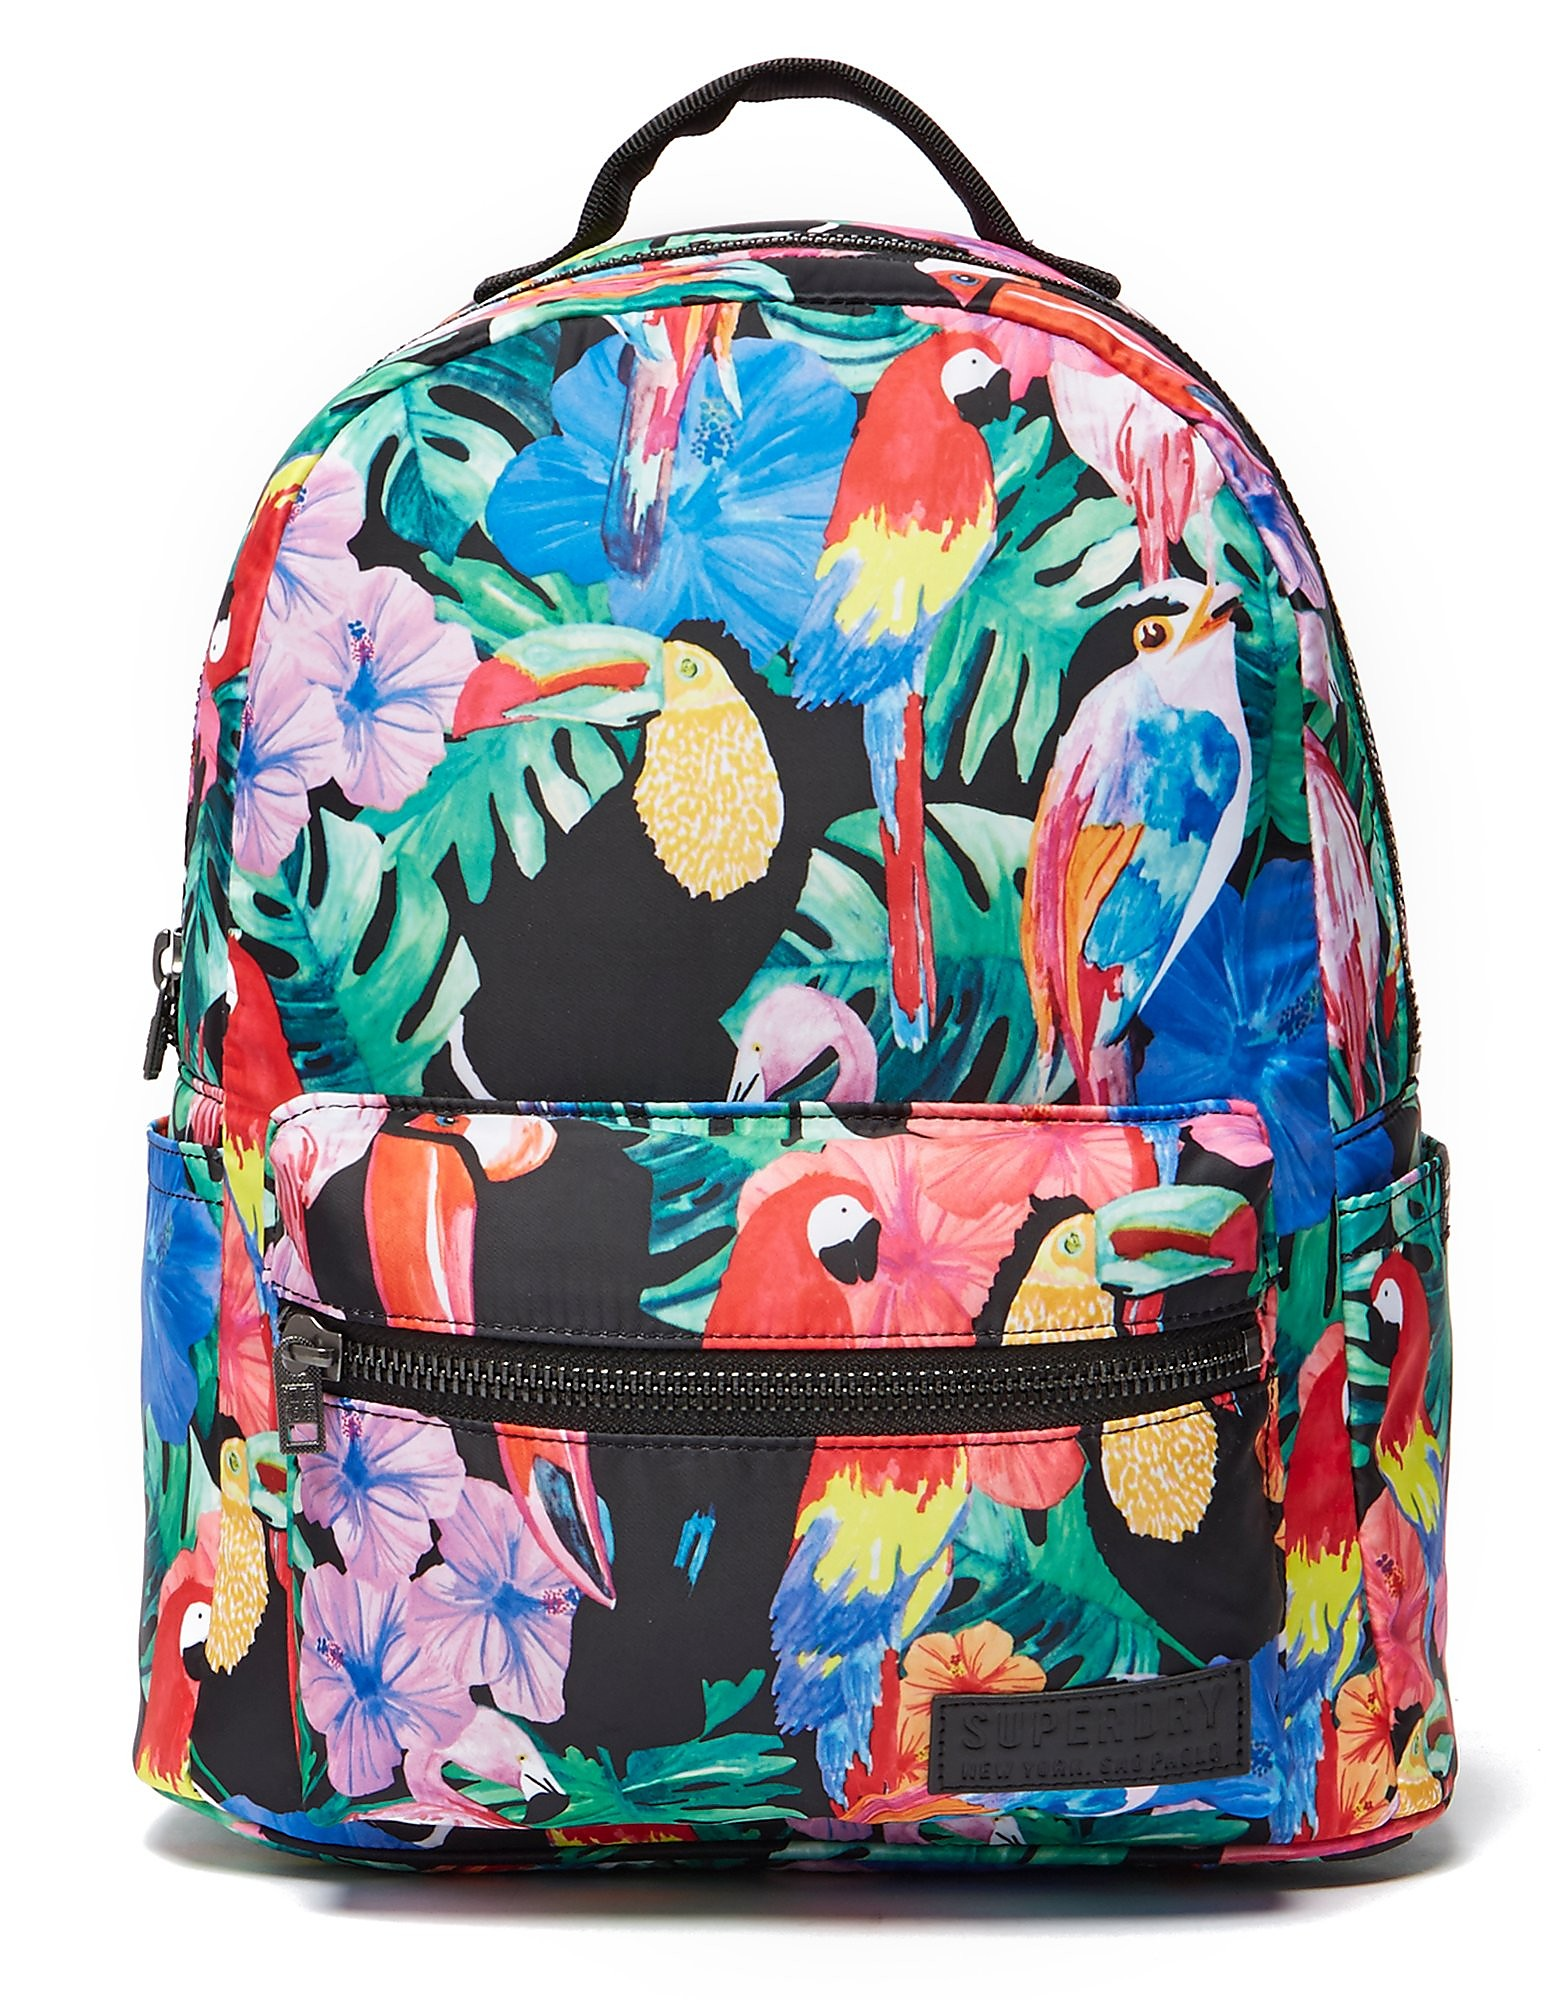 Superdry Urban Jungle Backpack